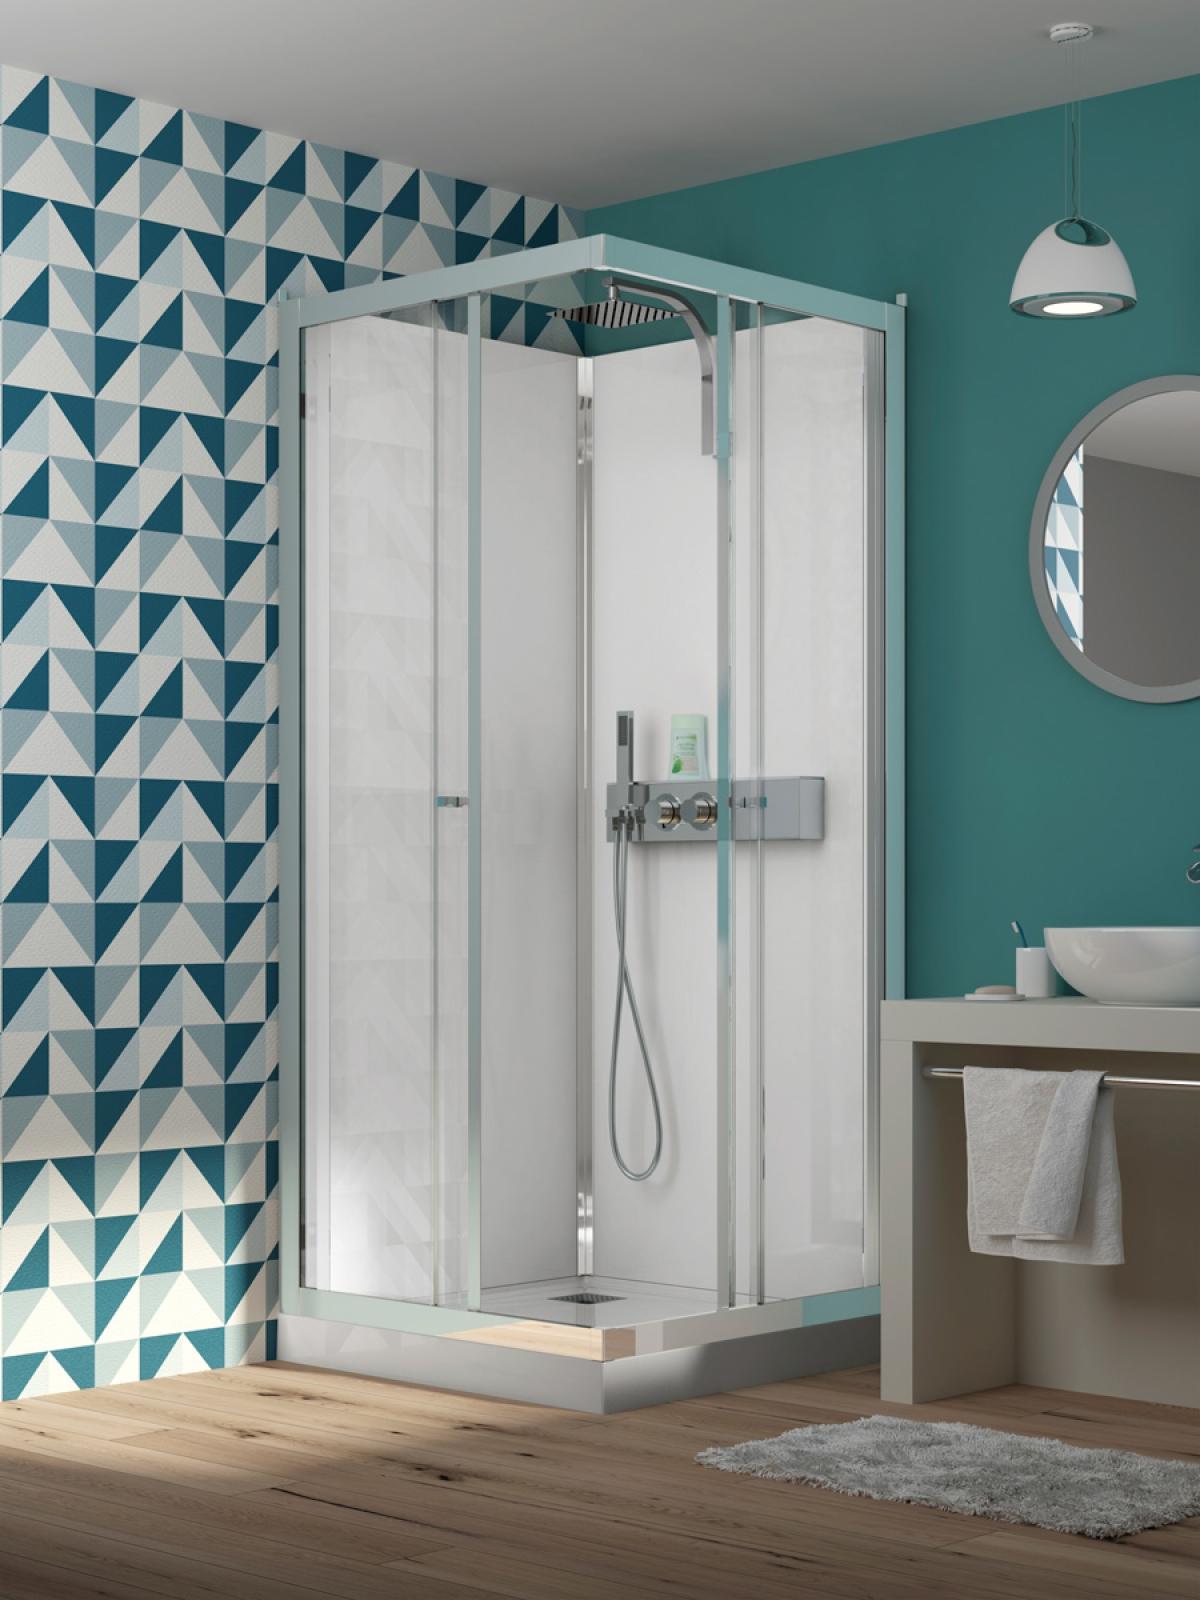 cabine de douche eden kinedo induscabel salle de. Black Bedroom Furniture Sets. Home Design Ideas